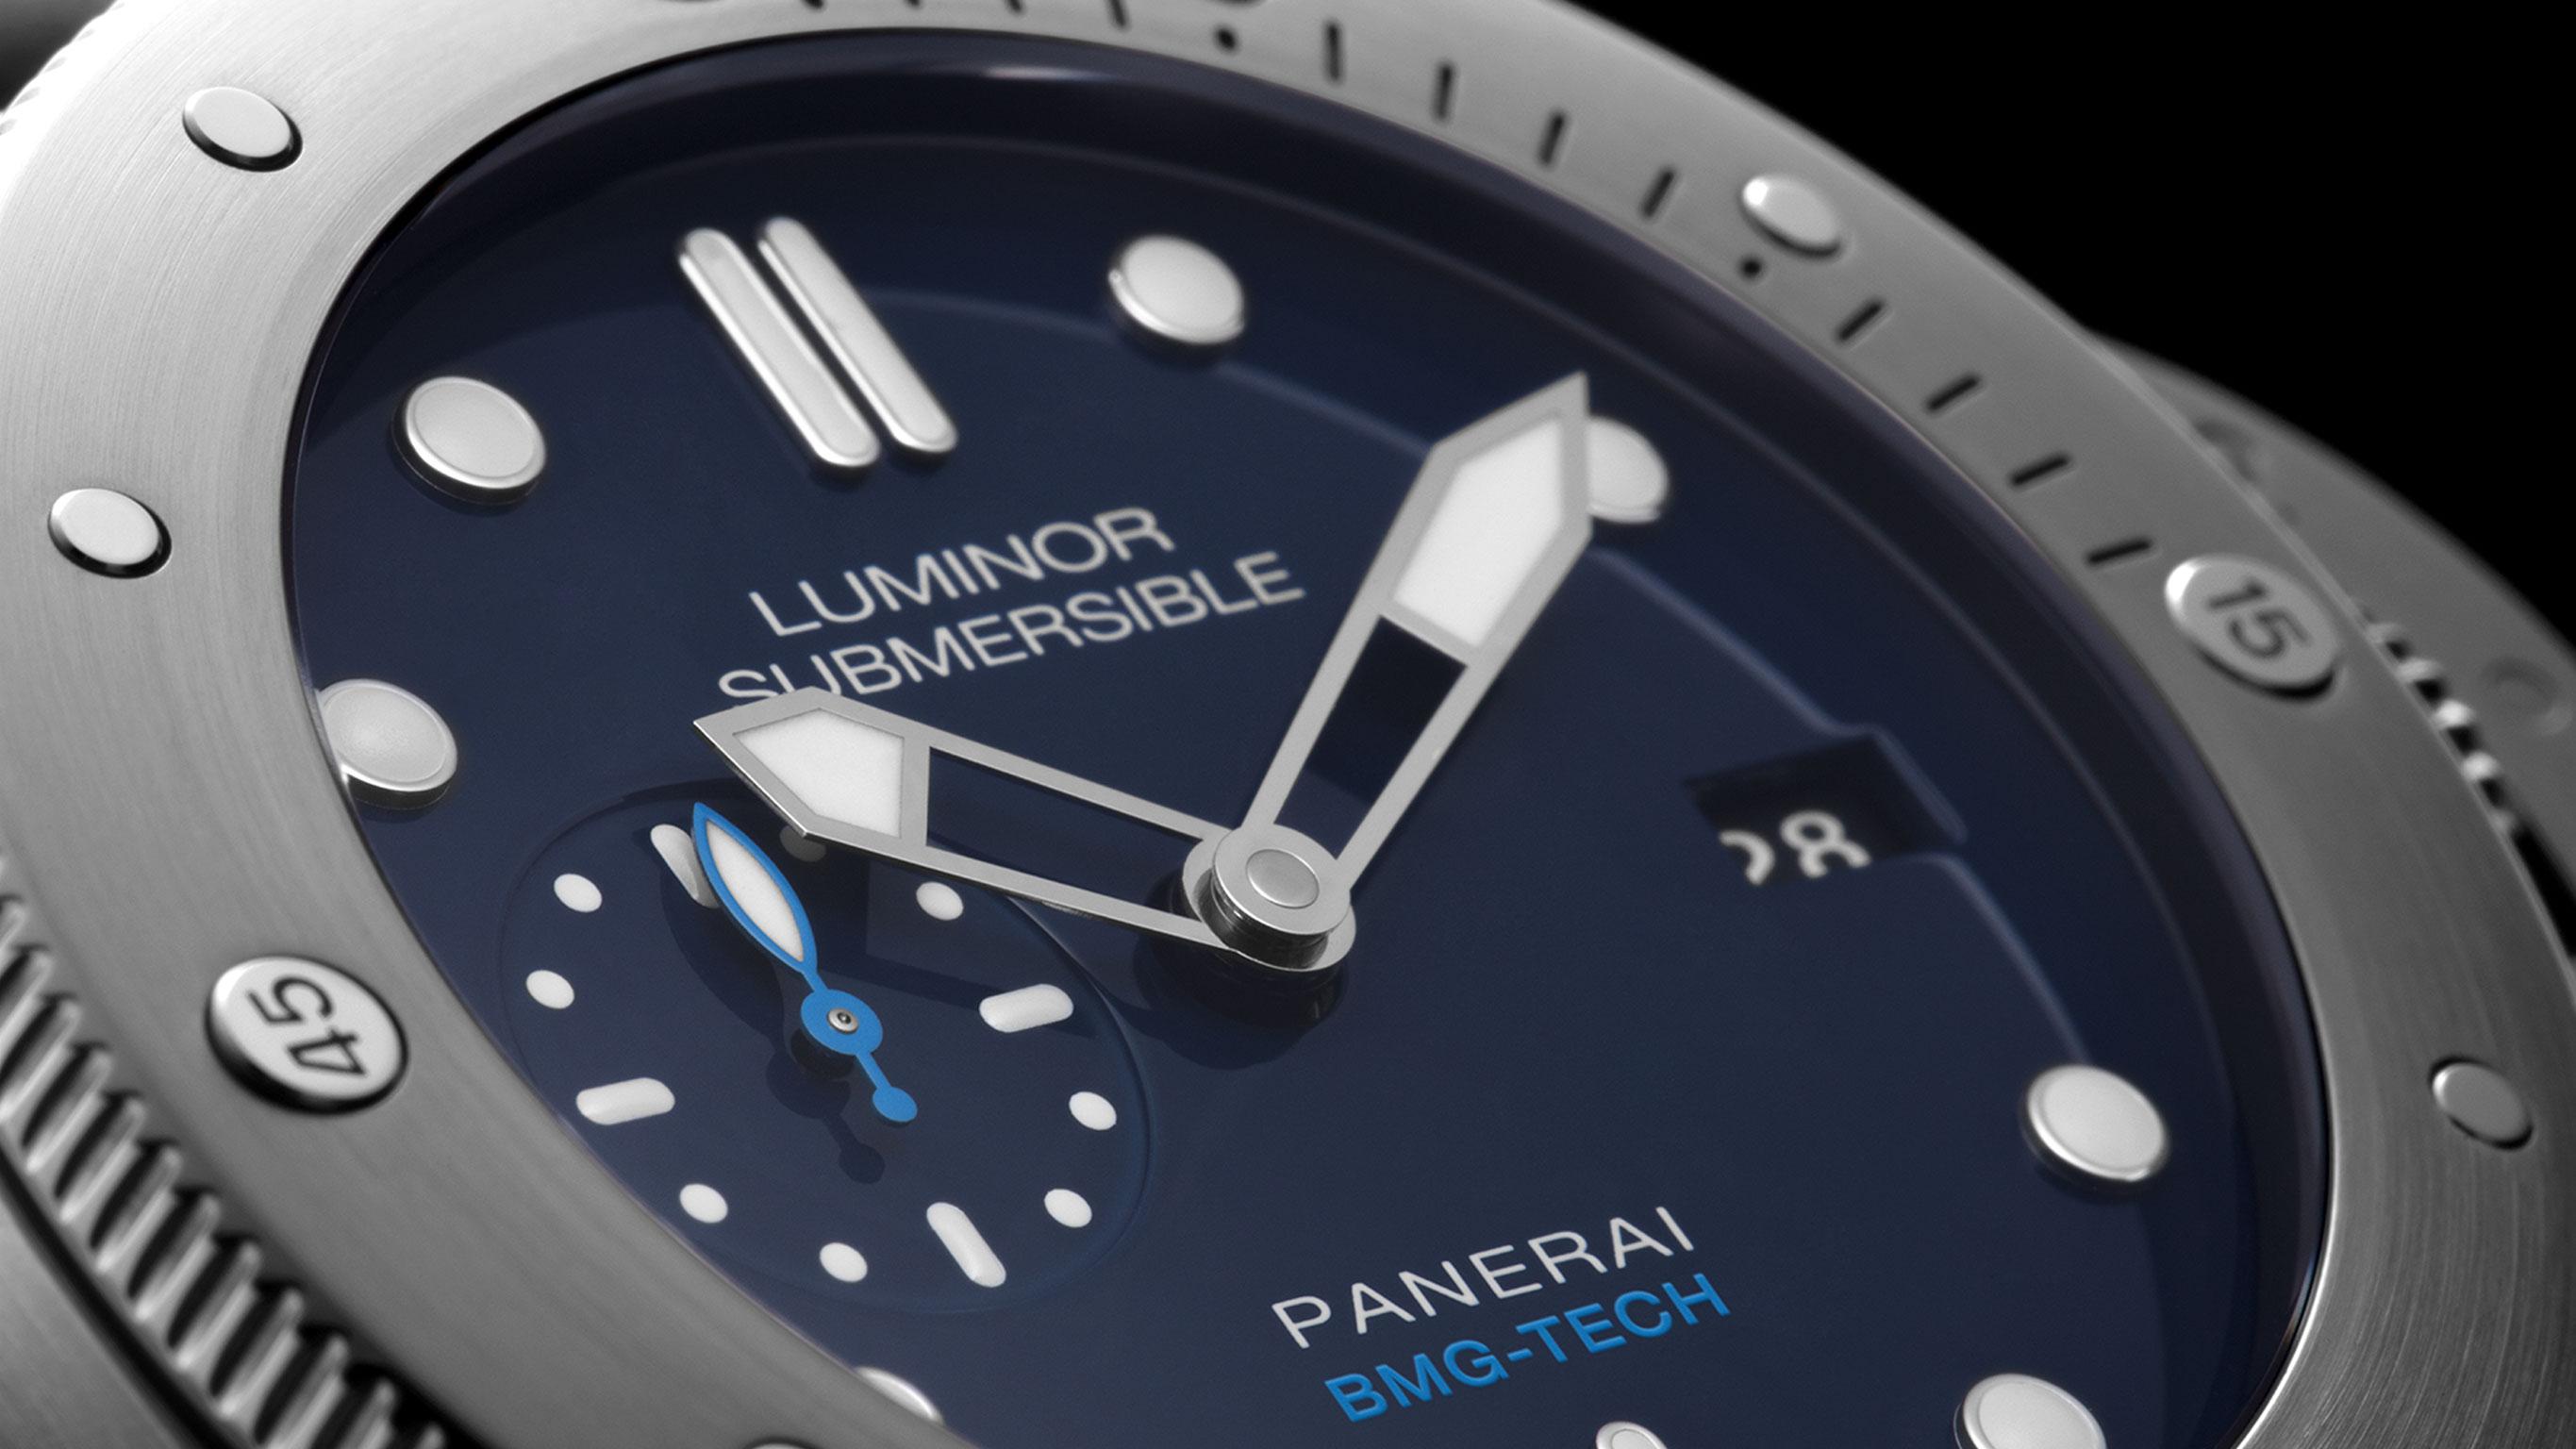 Часы Panerai Luminor Submersible 1950 BMG-TECH™ 3 Days Automatic – 47mm